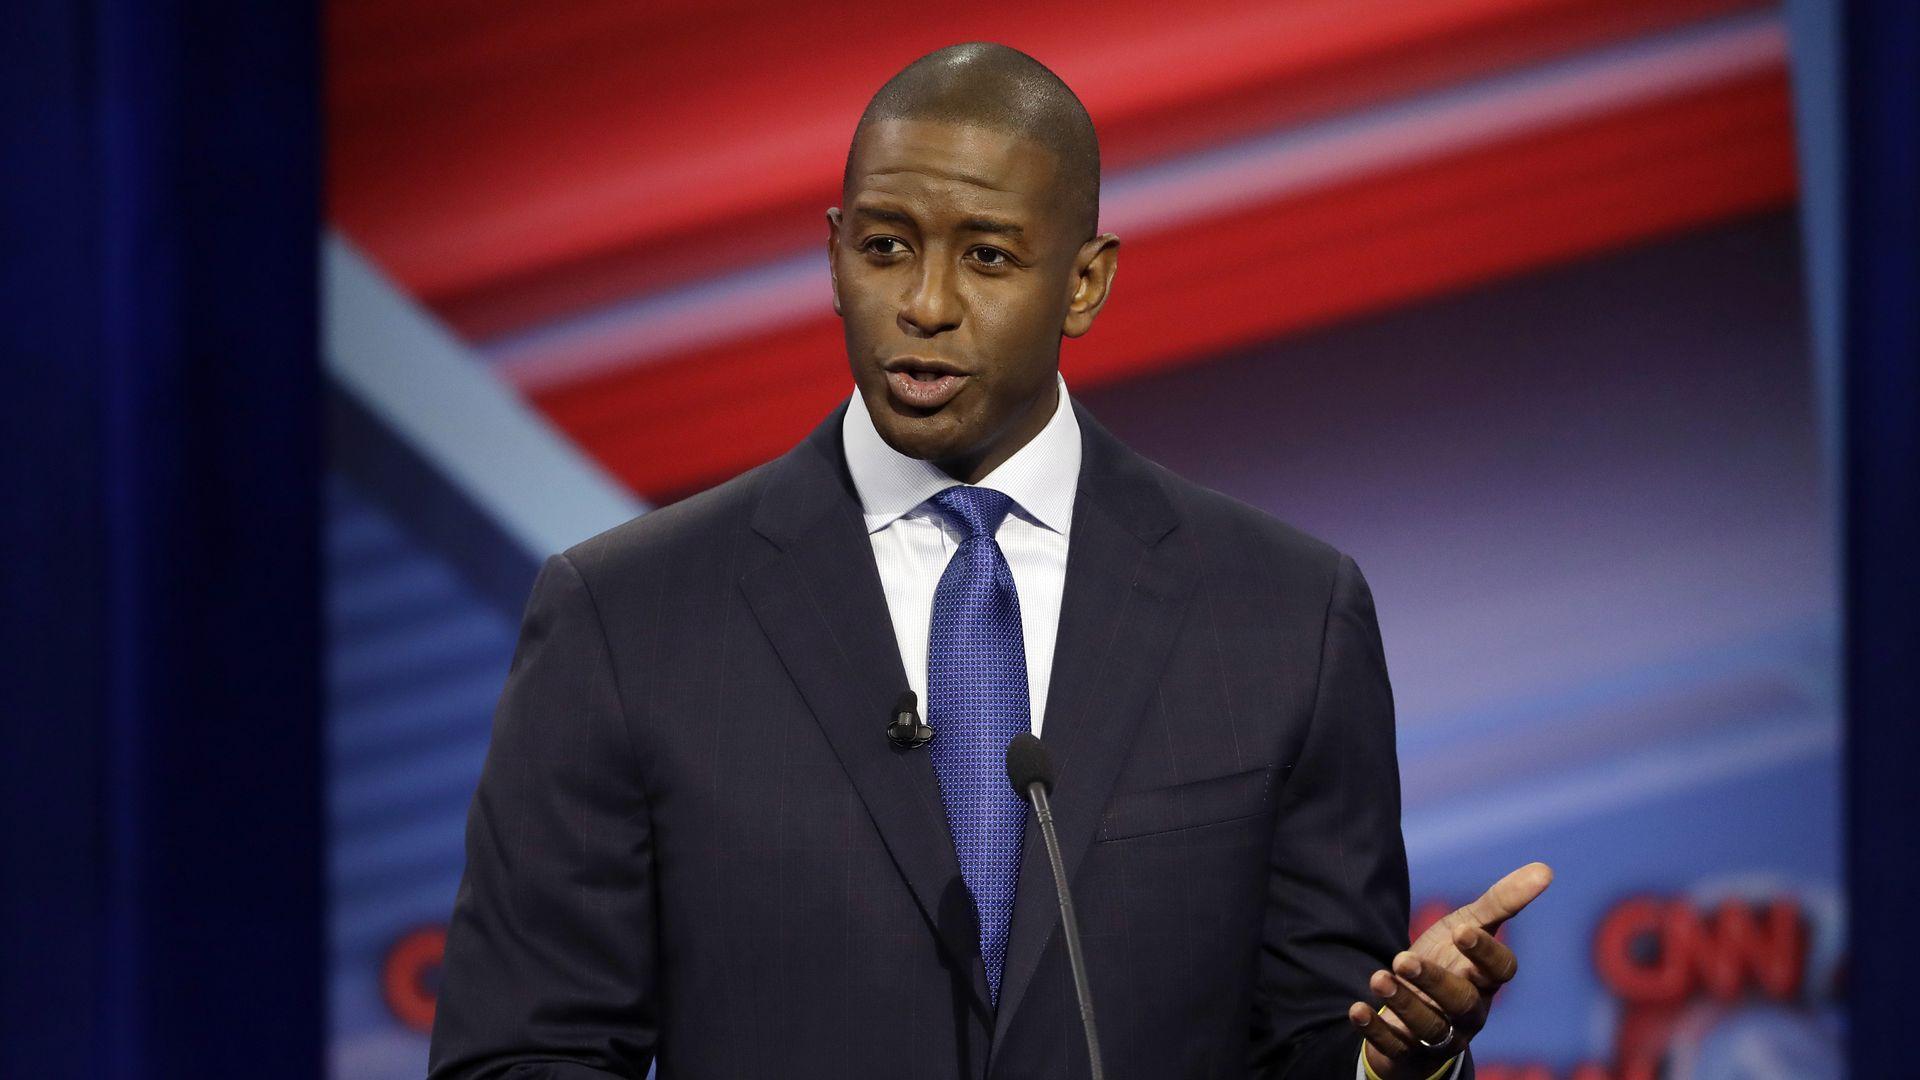 Florida Democratic gubernatorial candidate Andrew Gillum